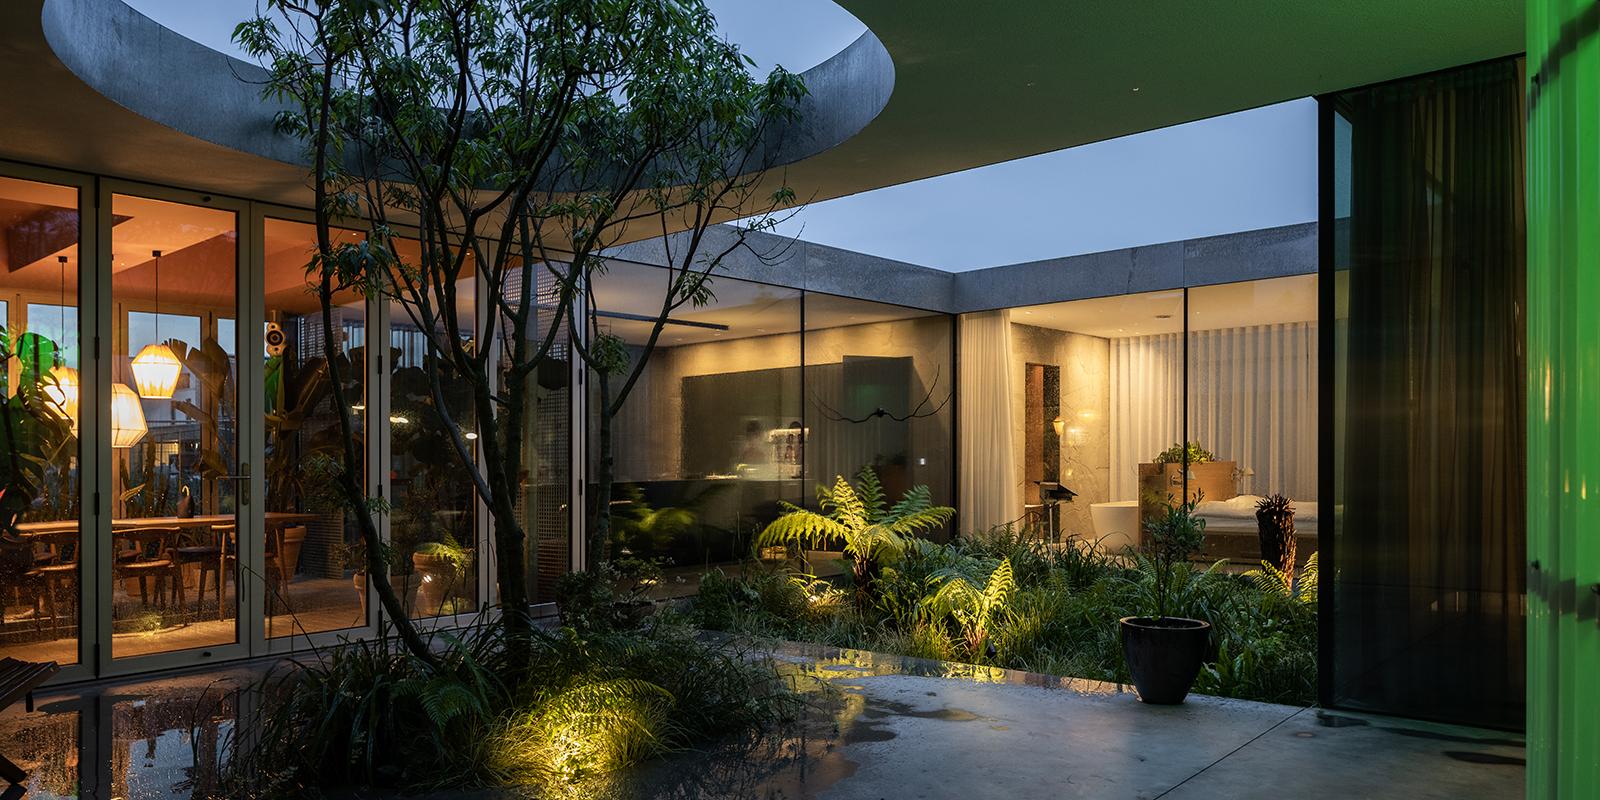 binnentuin, the art of living, buijtels buitengewone tuinen